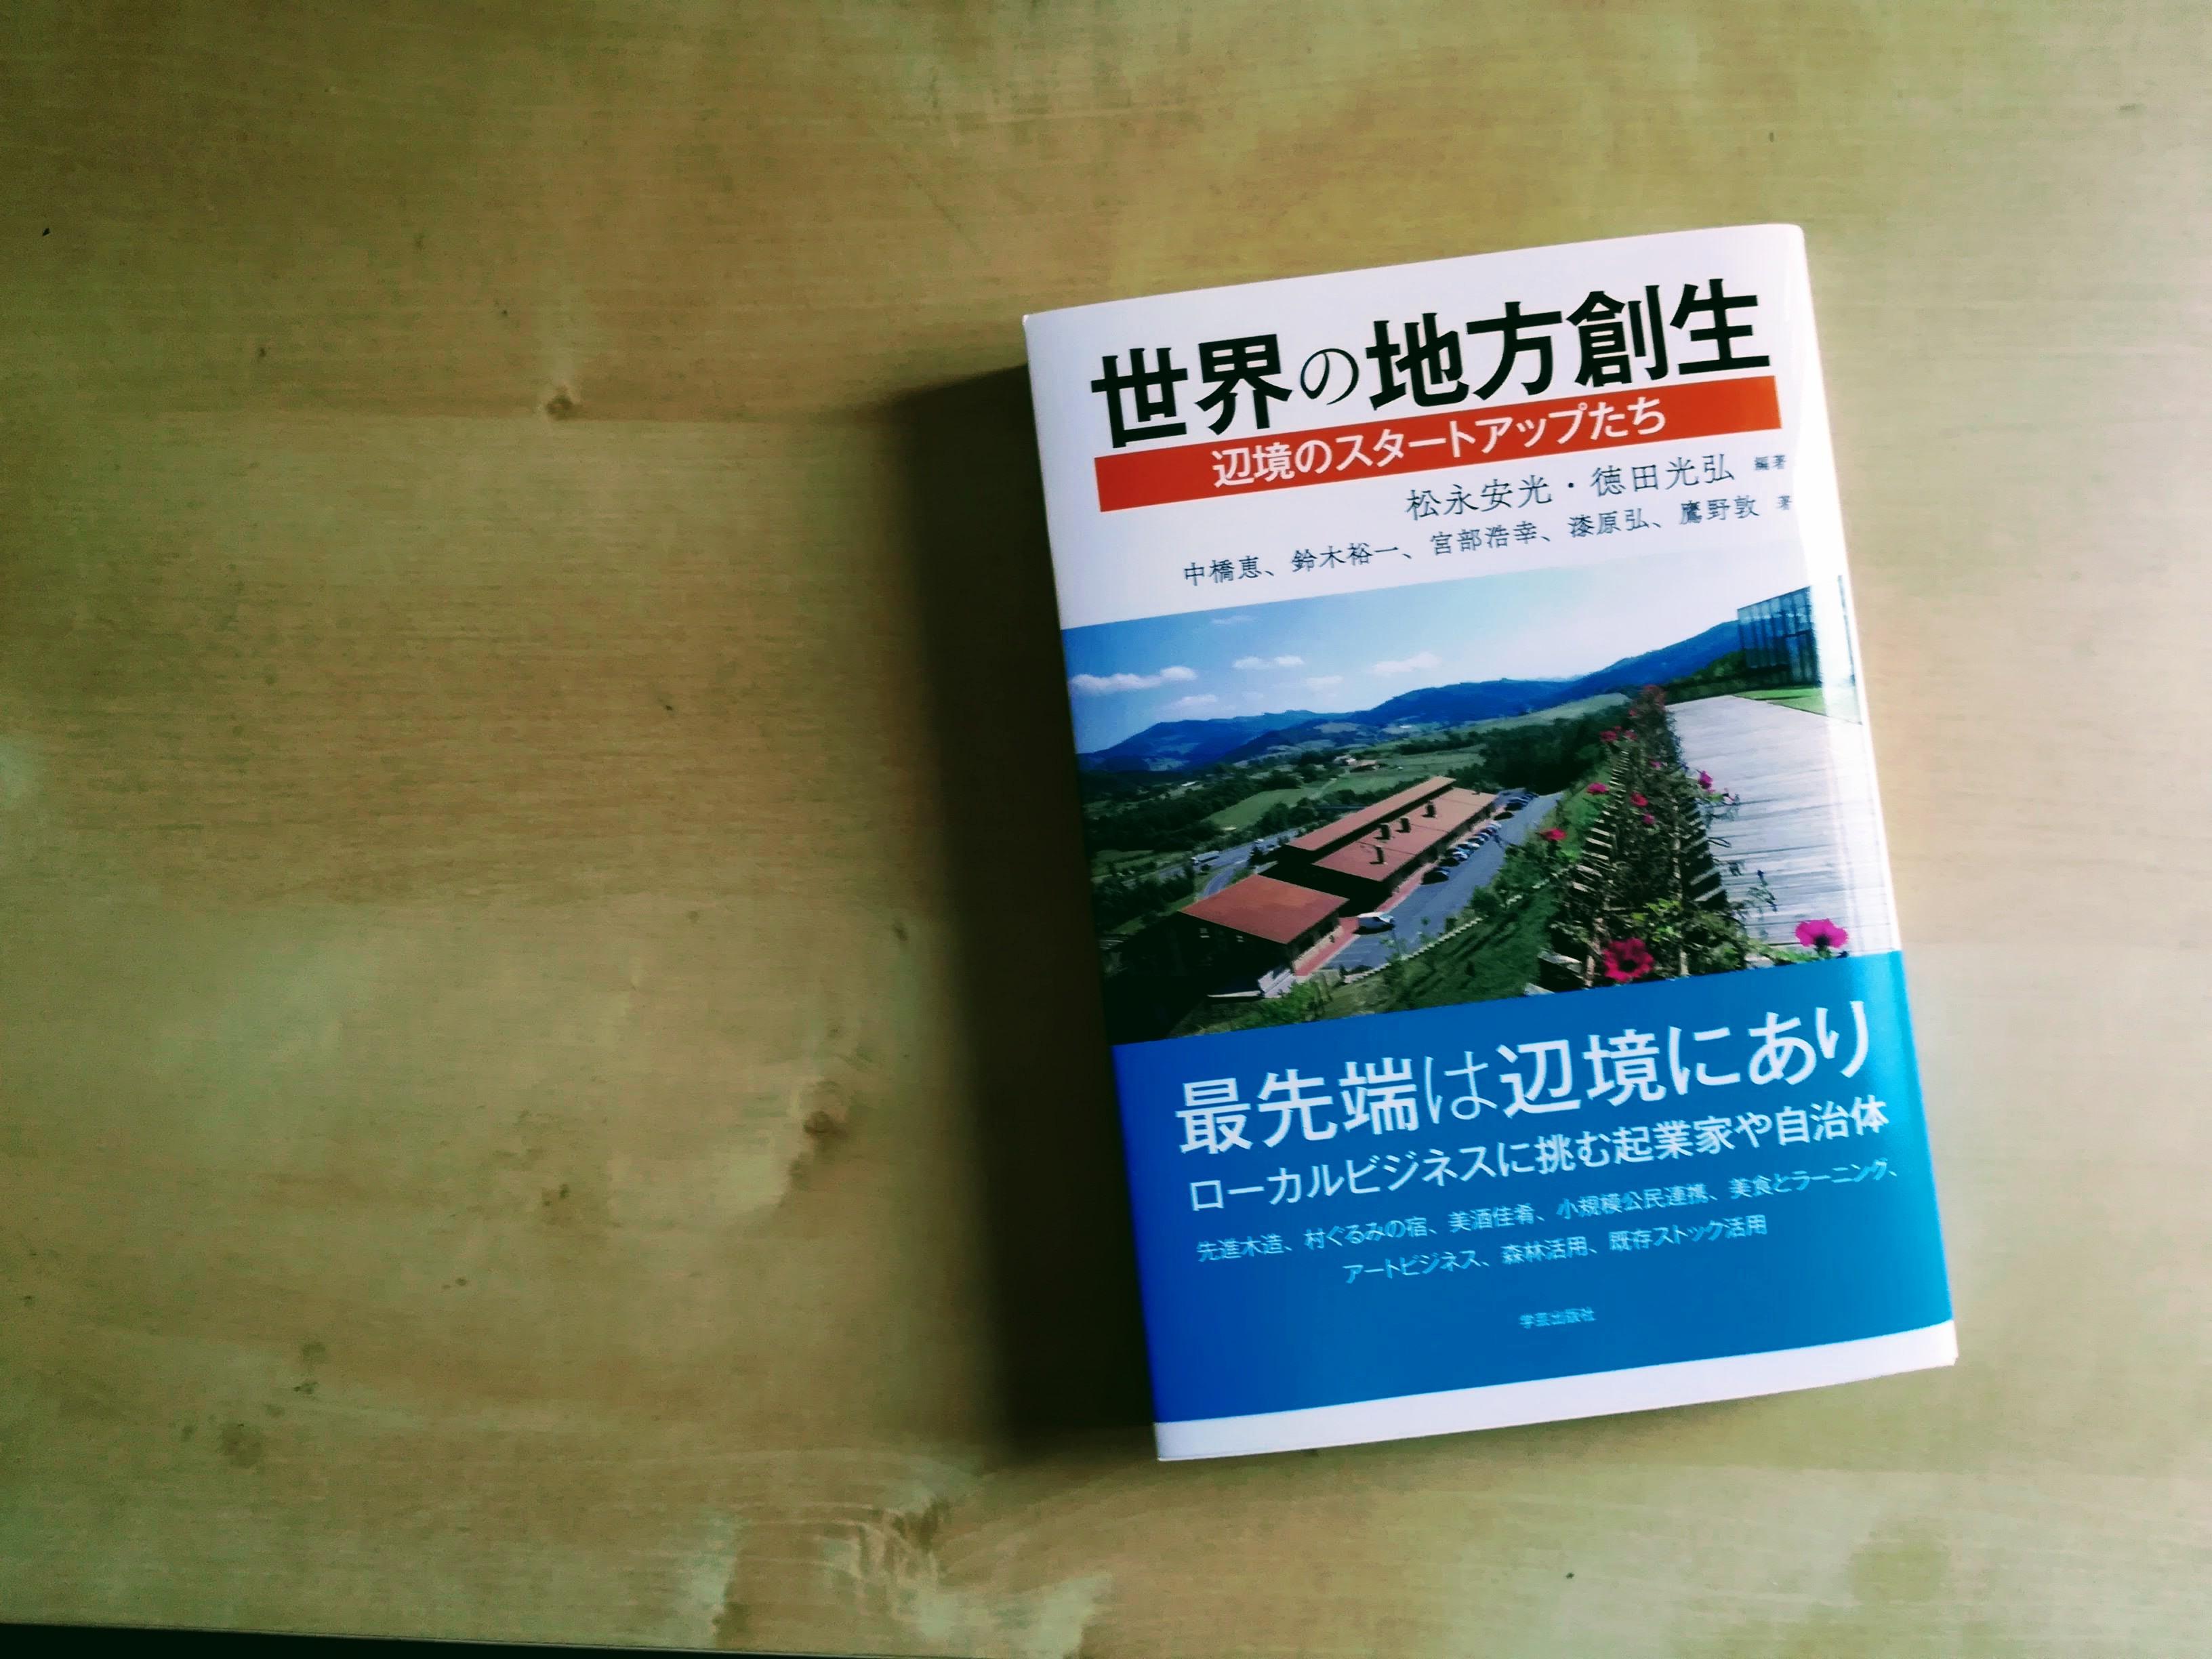 [book]世界の地方創生: 辺境のスタートアップたち